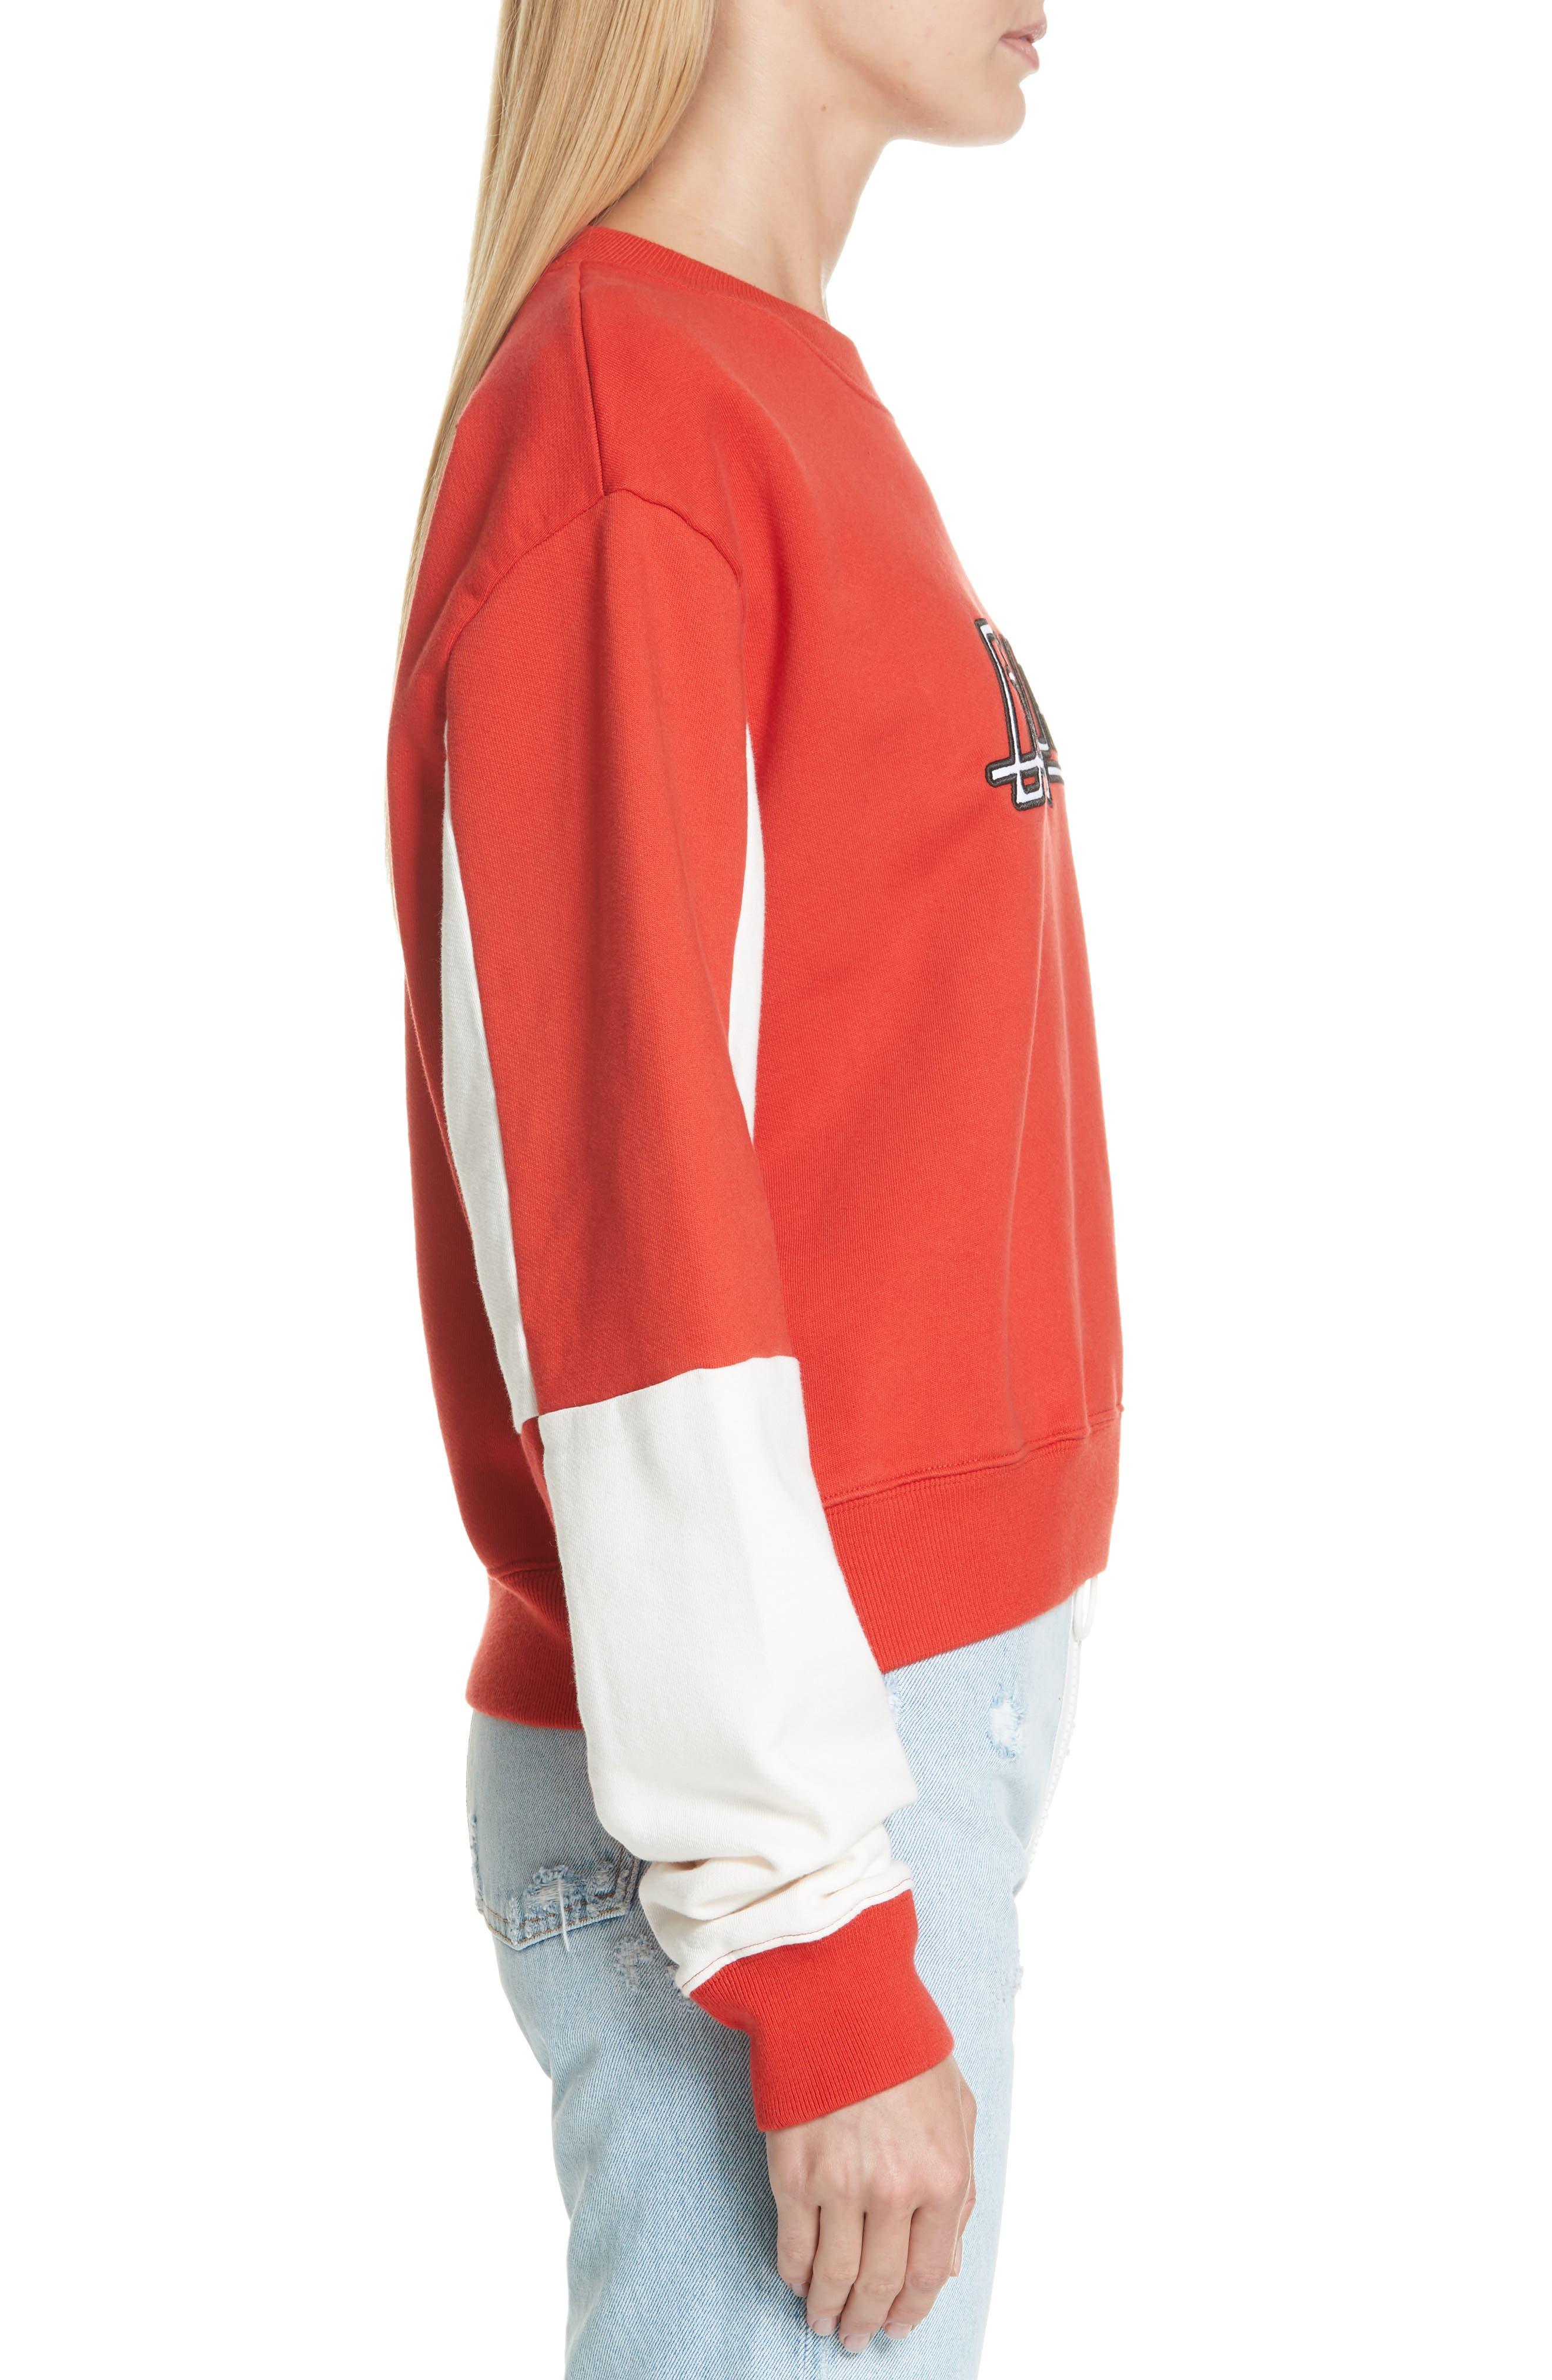 Jockey Checkerboard Crewneck Sweatshirt,                             Alternate thumbnail 3, color,                             600